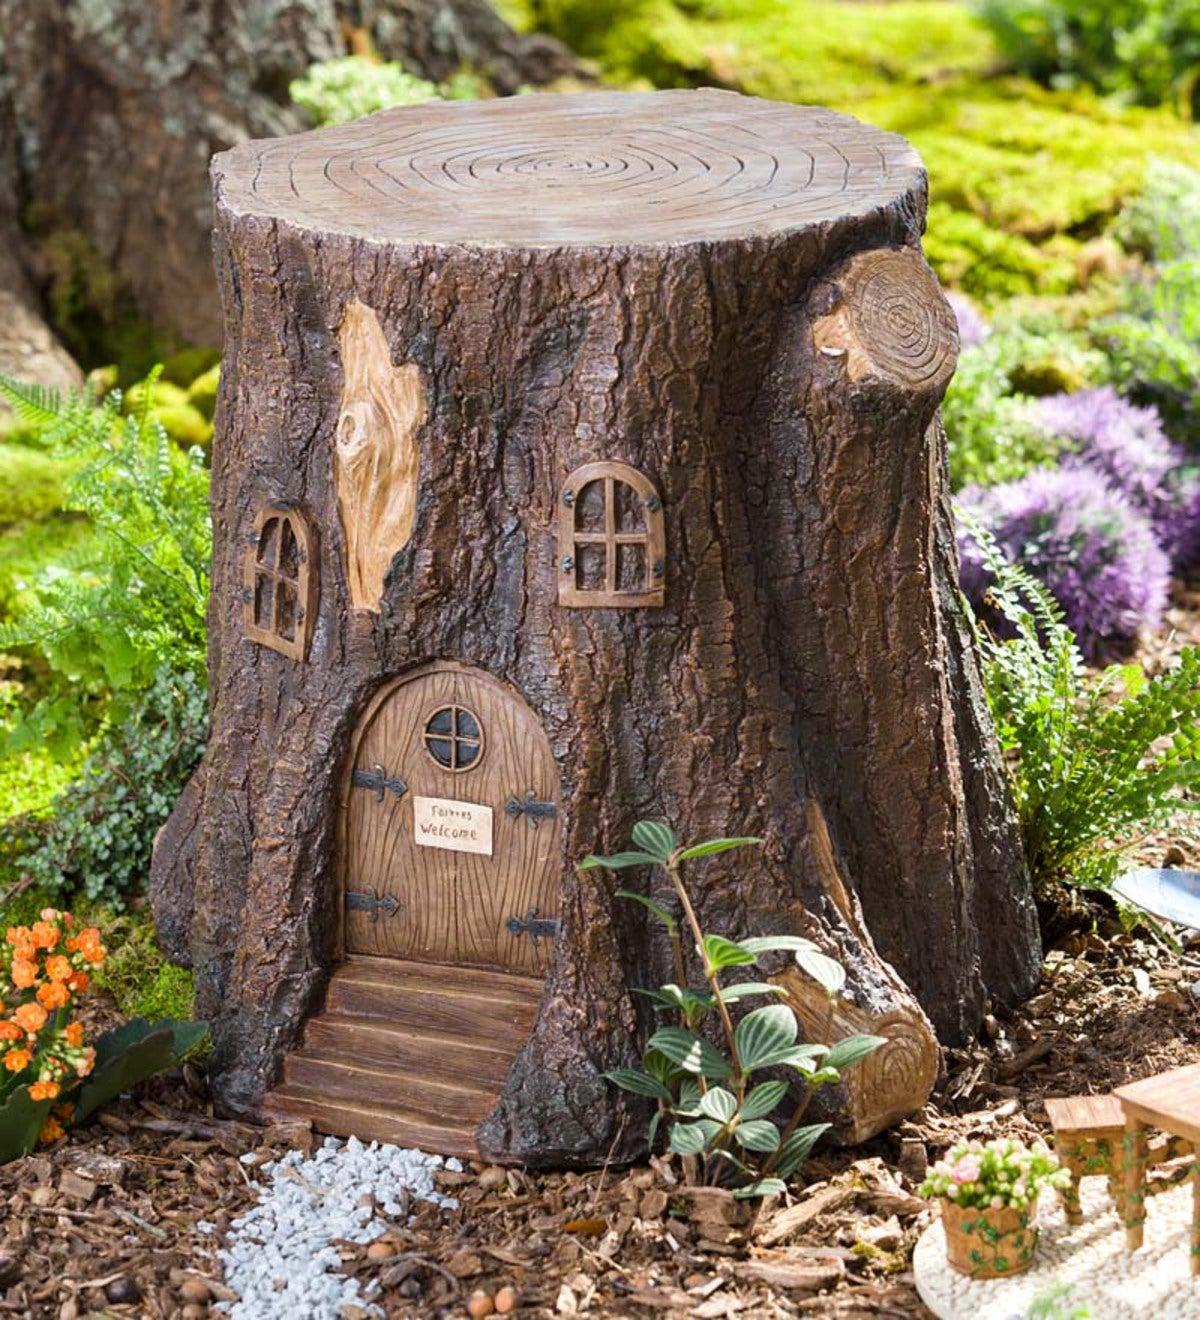 Whimsical Fairy Garden Tree Stump Stool Plowhearth